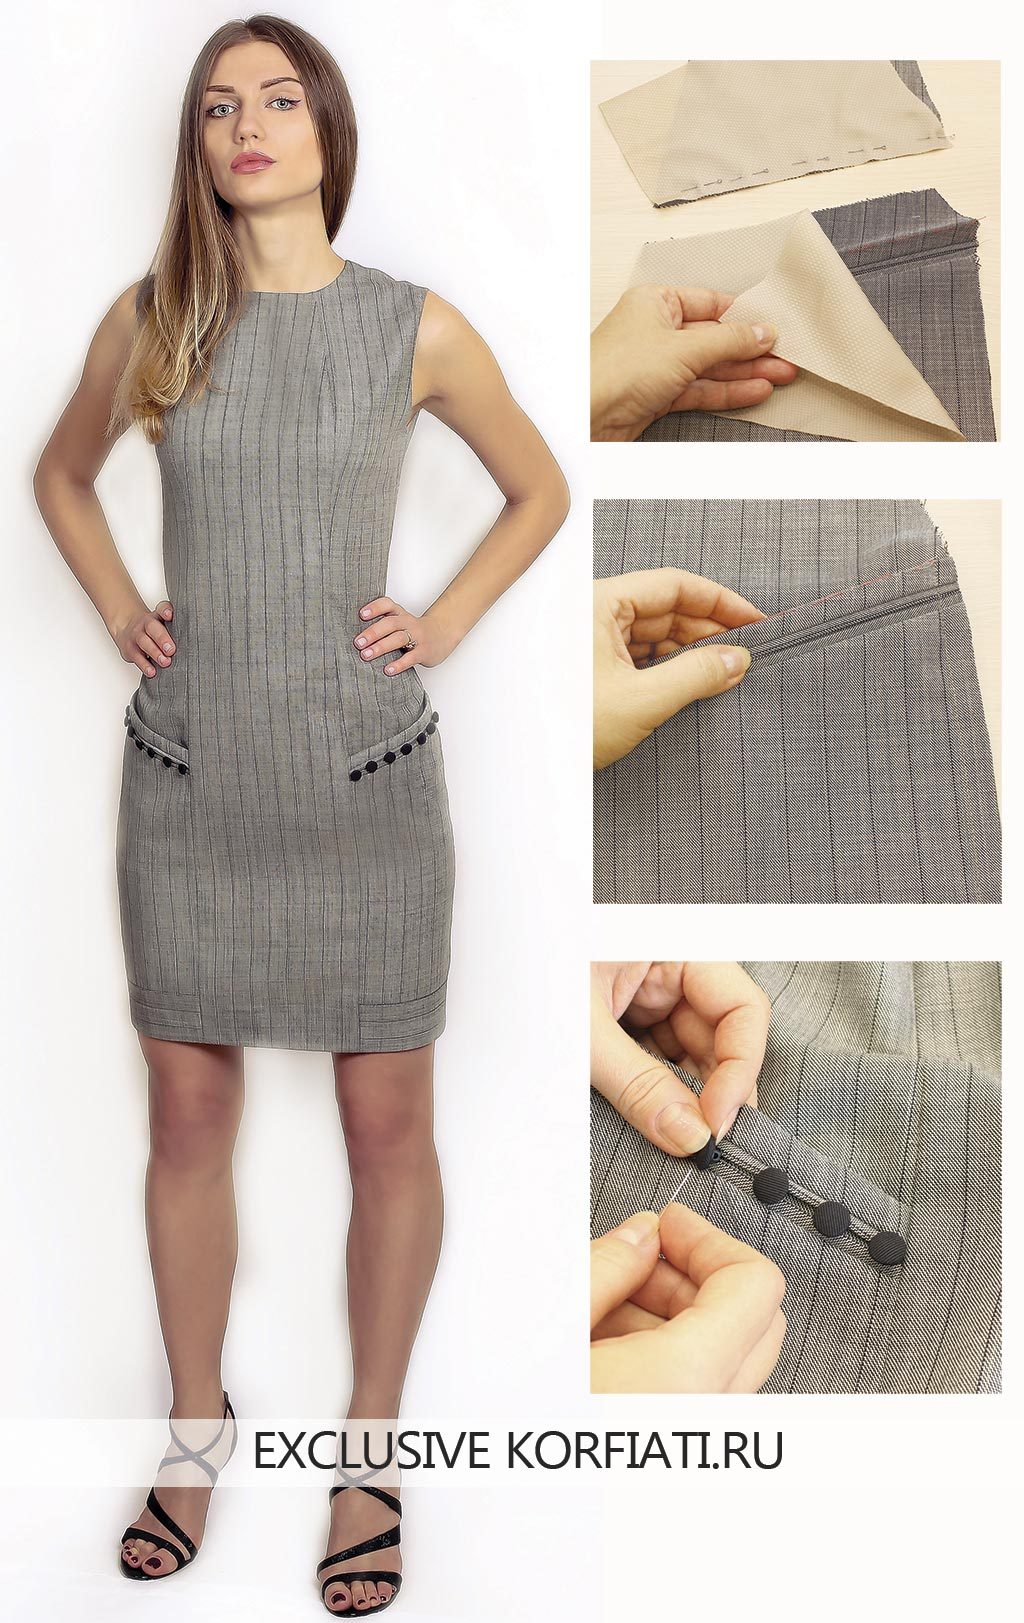 Как украсить карман на платье